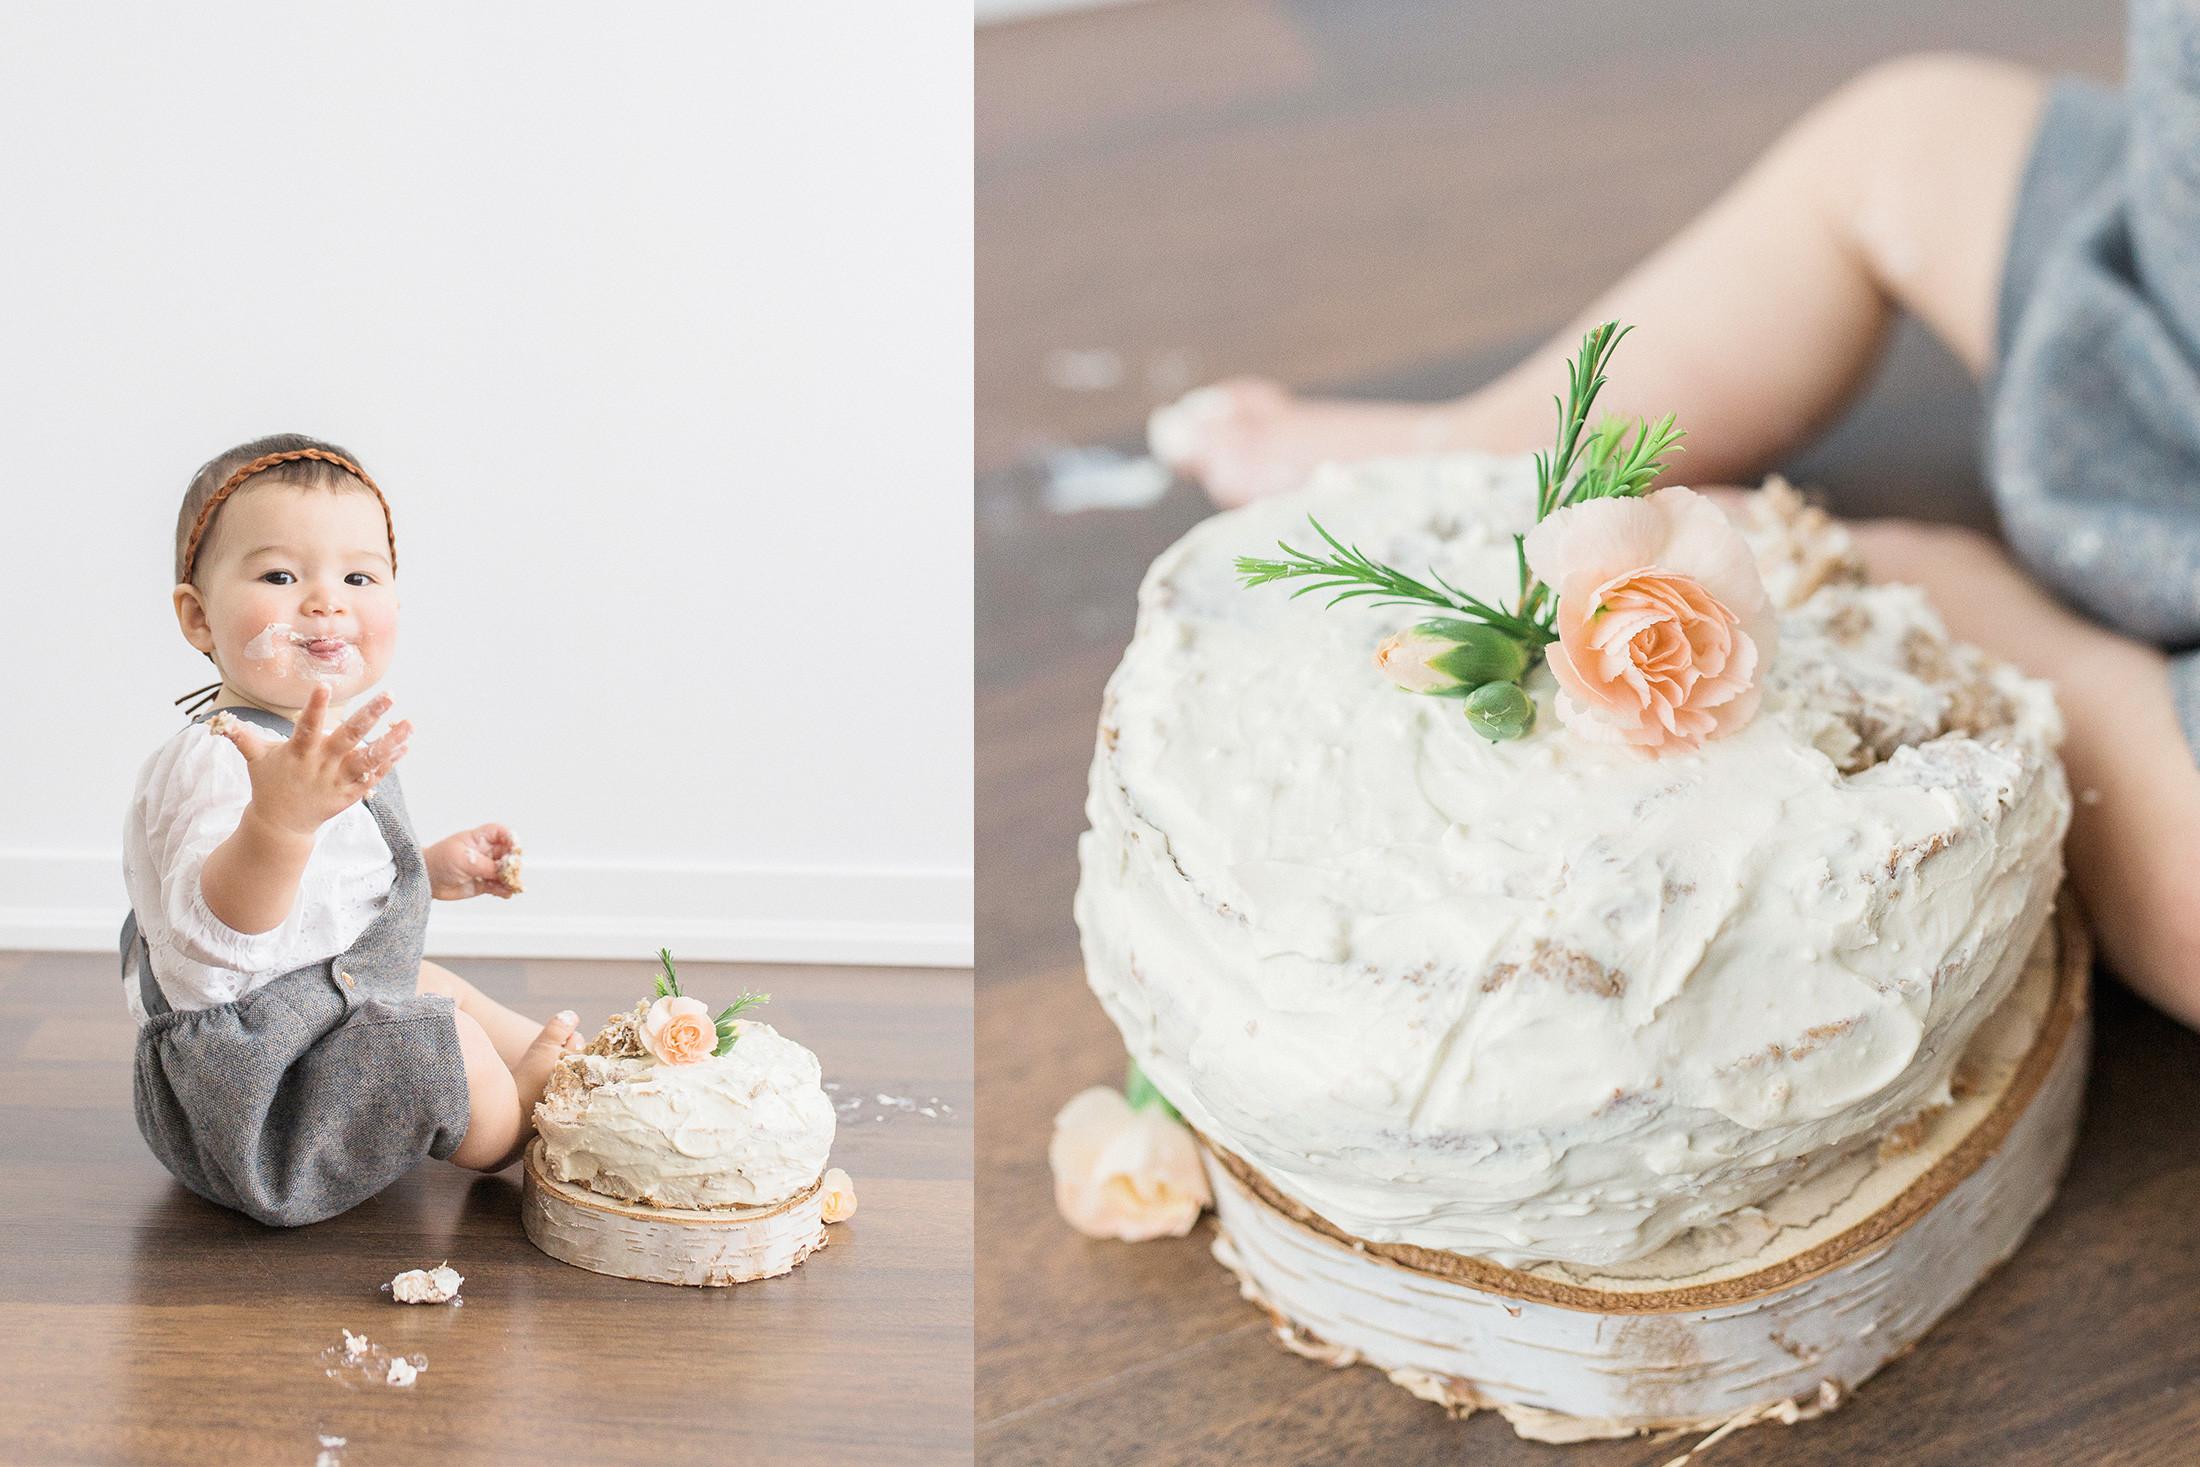 Healthy Baby First Birthday Cake  recipe healthy sugar free smash cake for baby s birthday